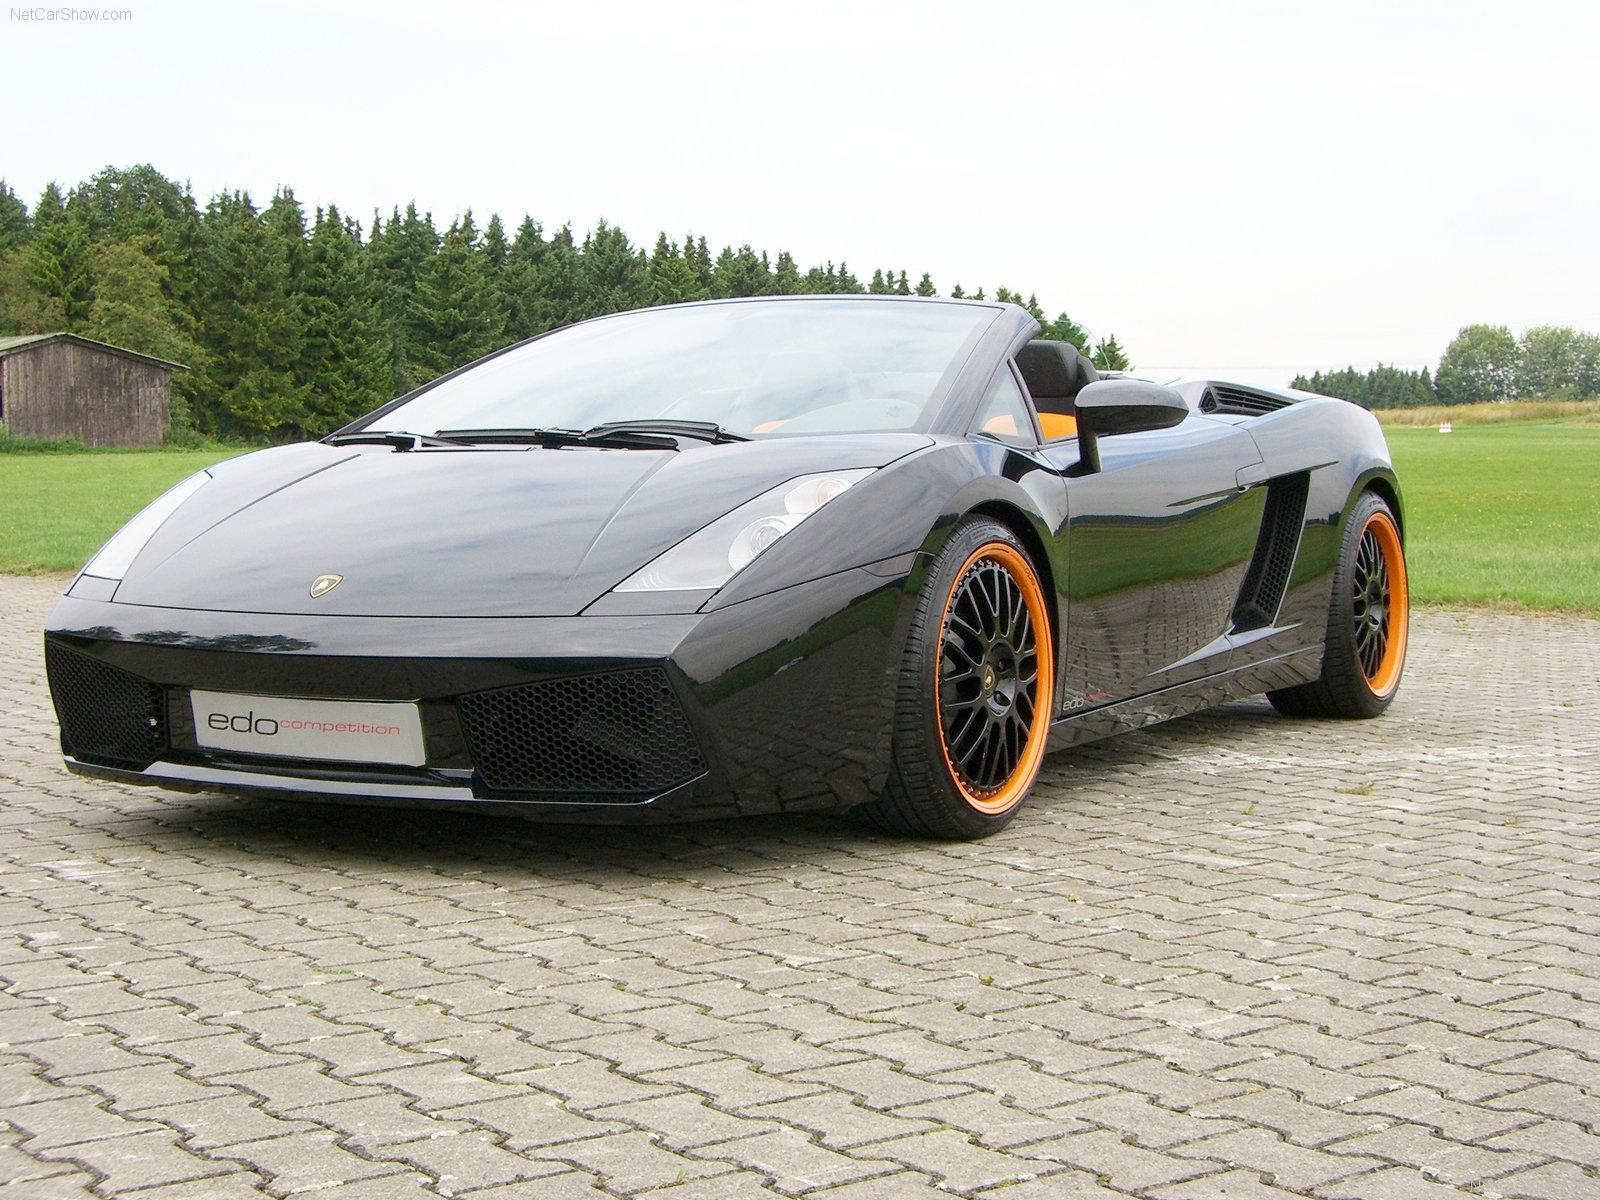 Hình ảnh siêu xe Edo Lamborghini Gallardo Spyder 2005 & nội ngoại thất